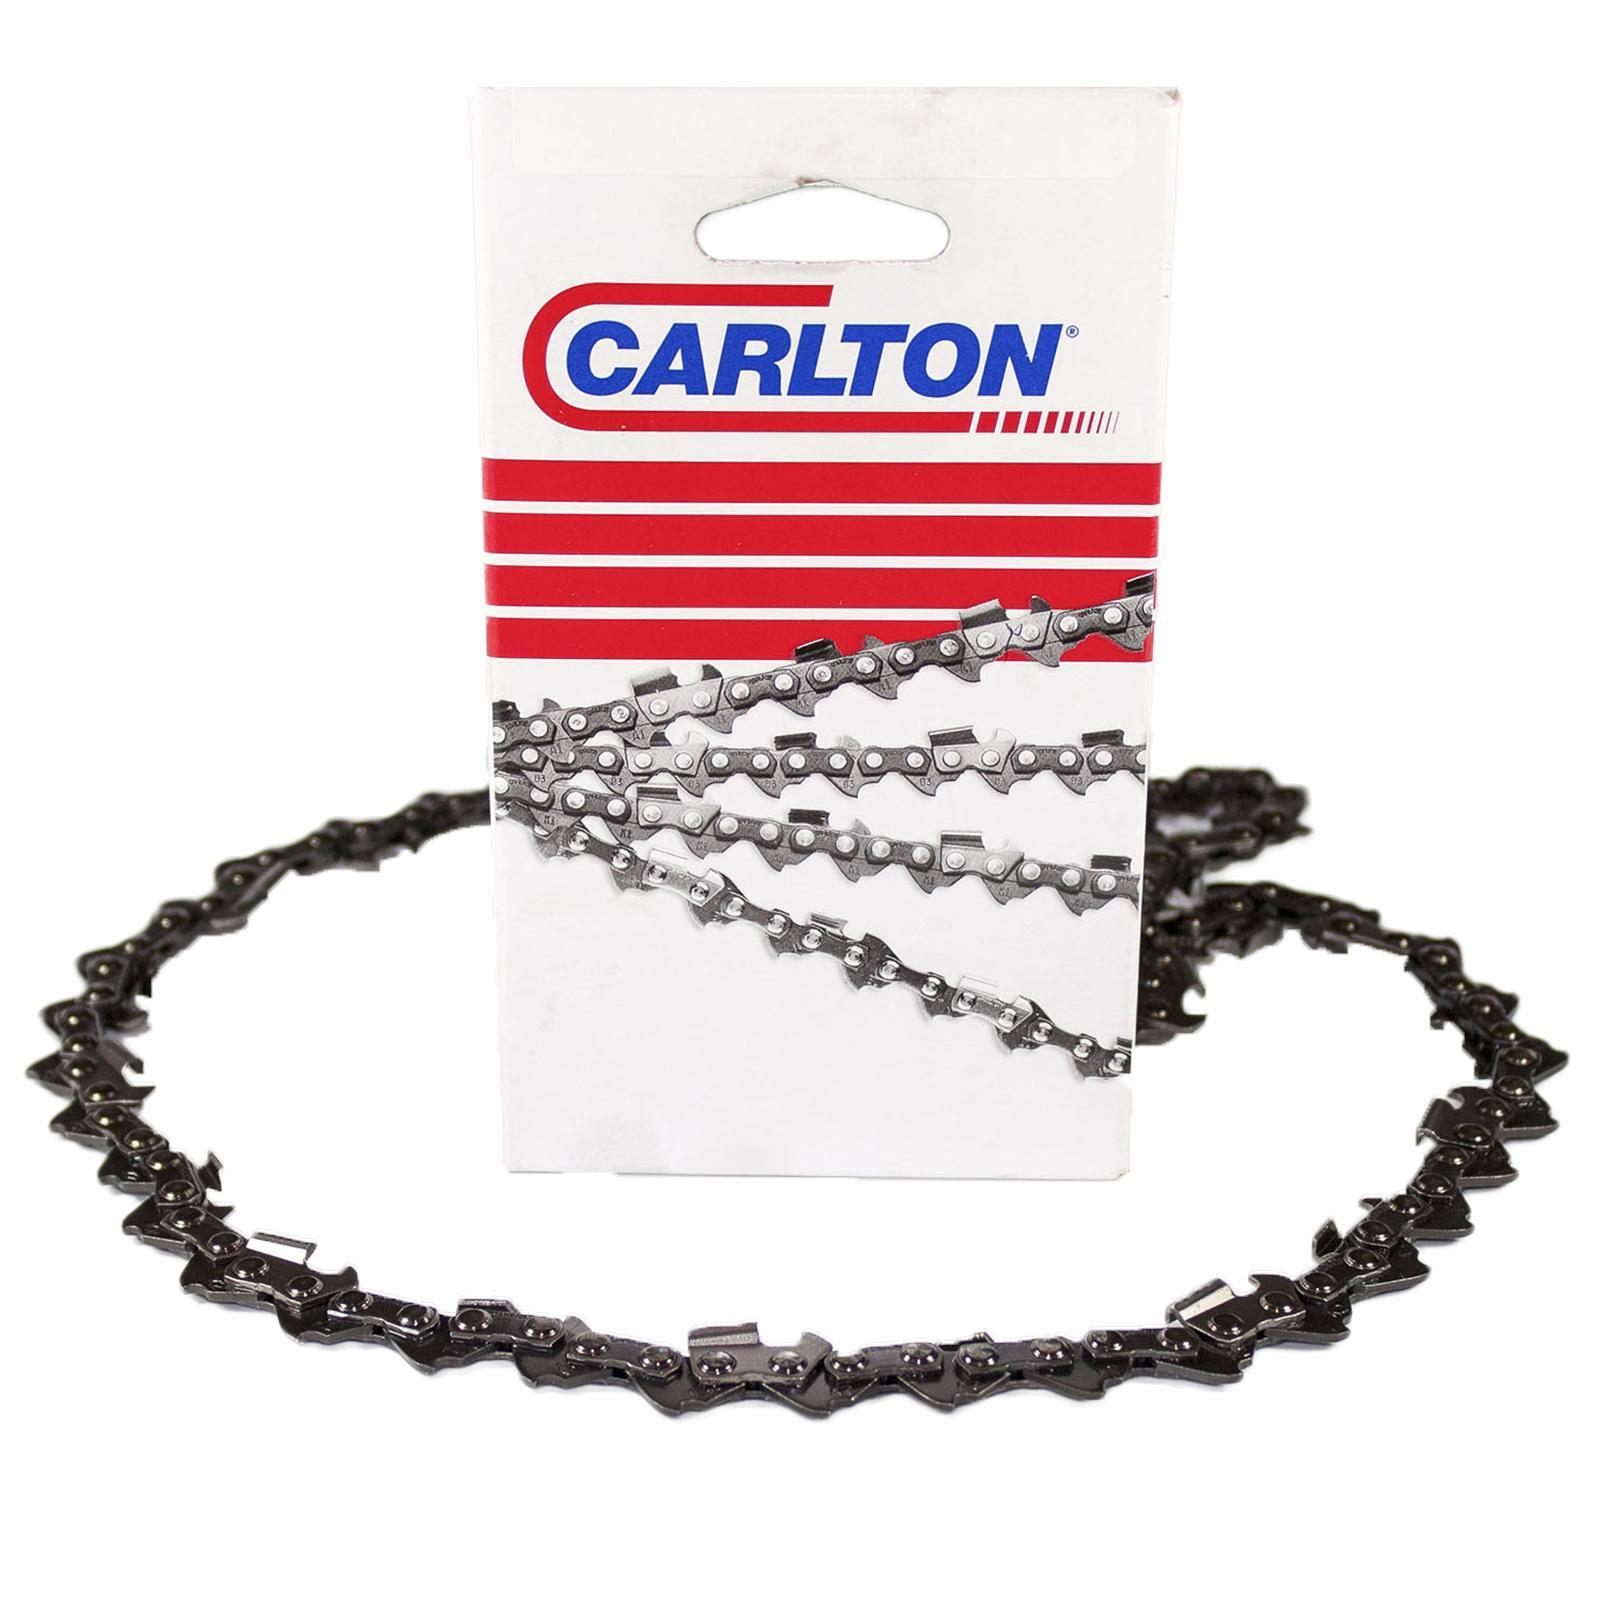 carlton catena per motosega carlton 3/8 sp 1.3 cm 35 52 maglie